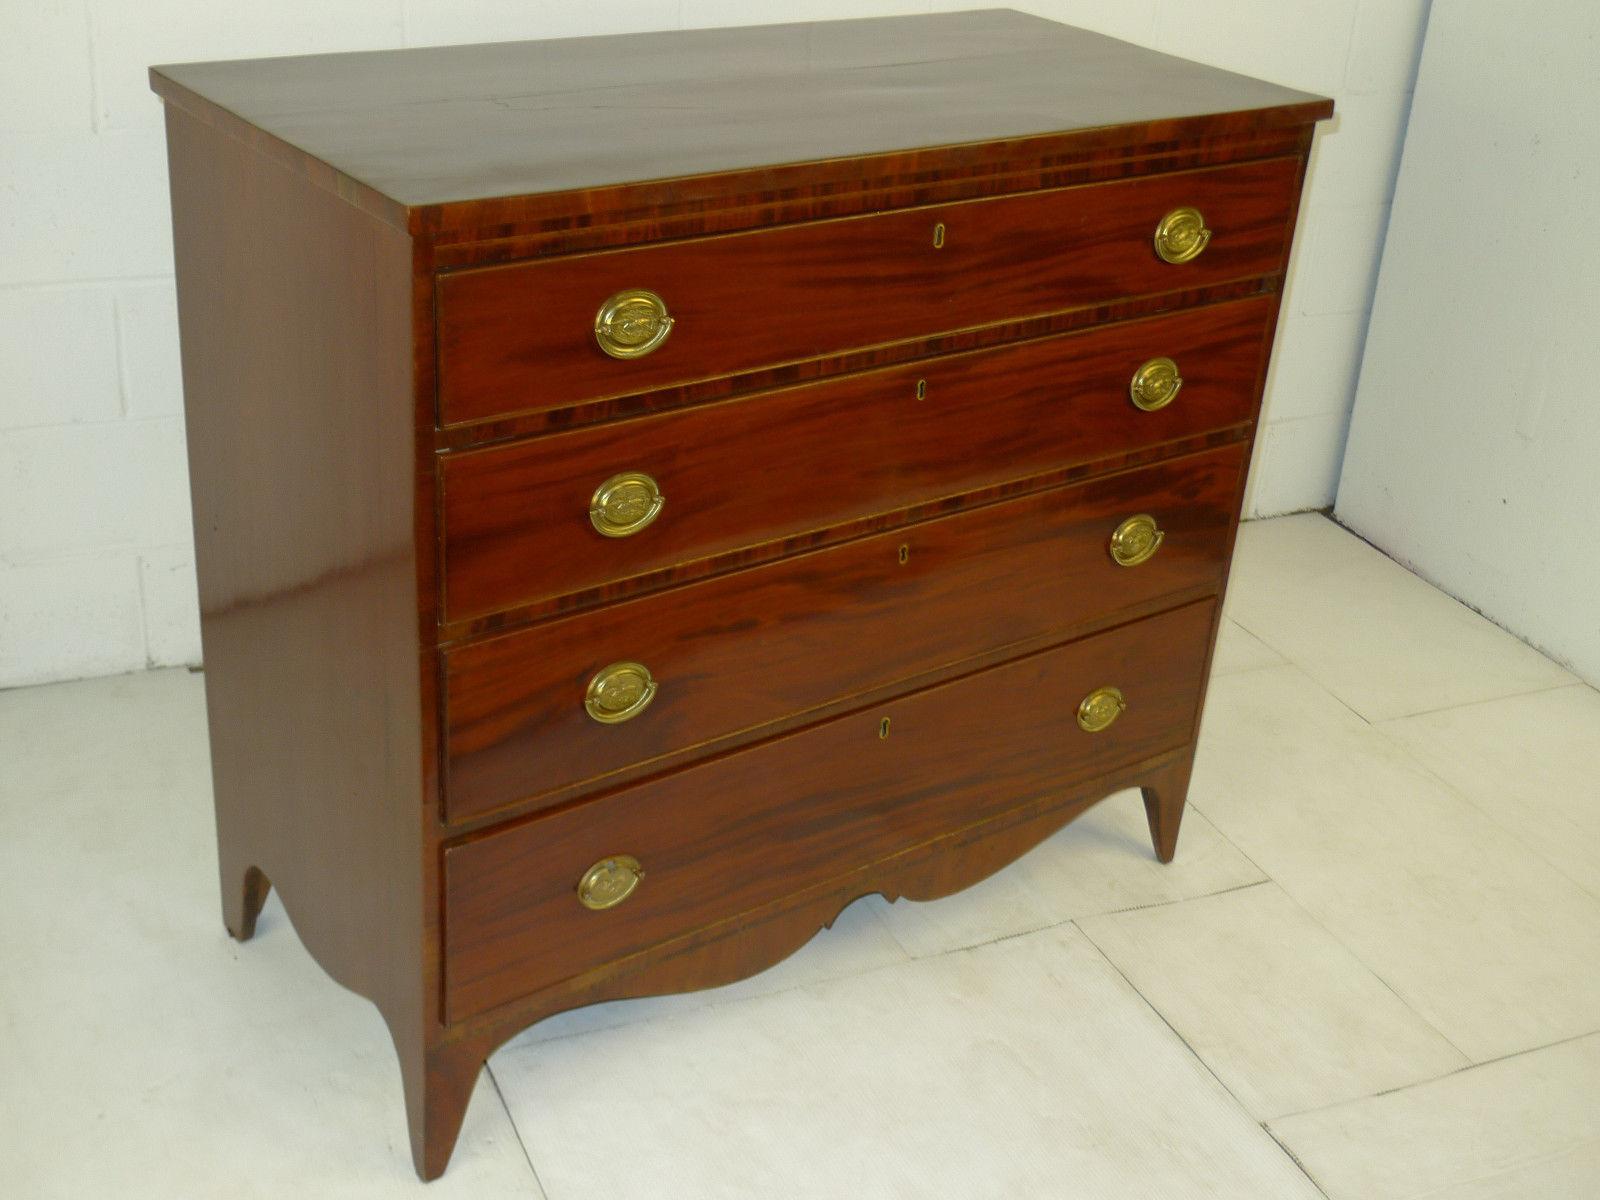 Federal Period Hepplewhite Mahogany Chest Drawers Dresser